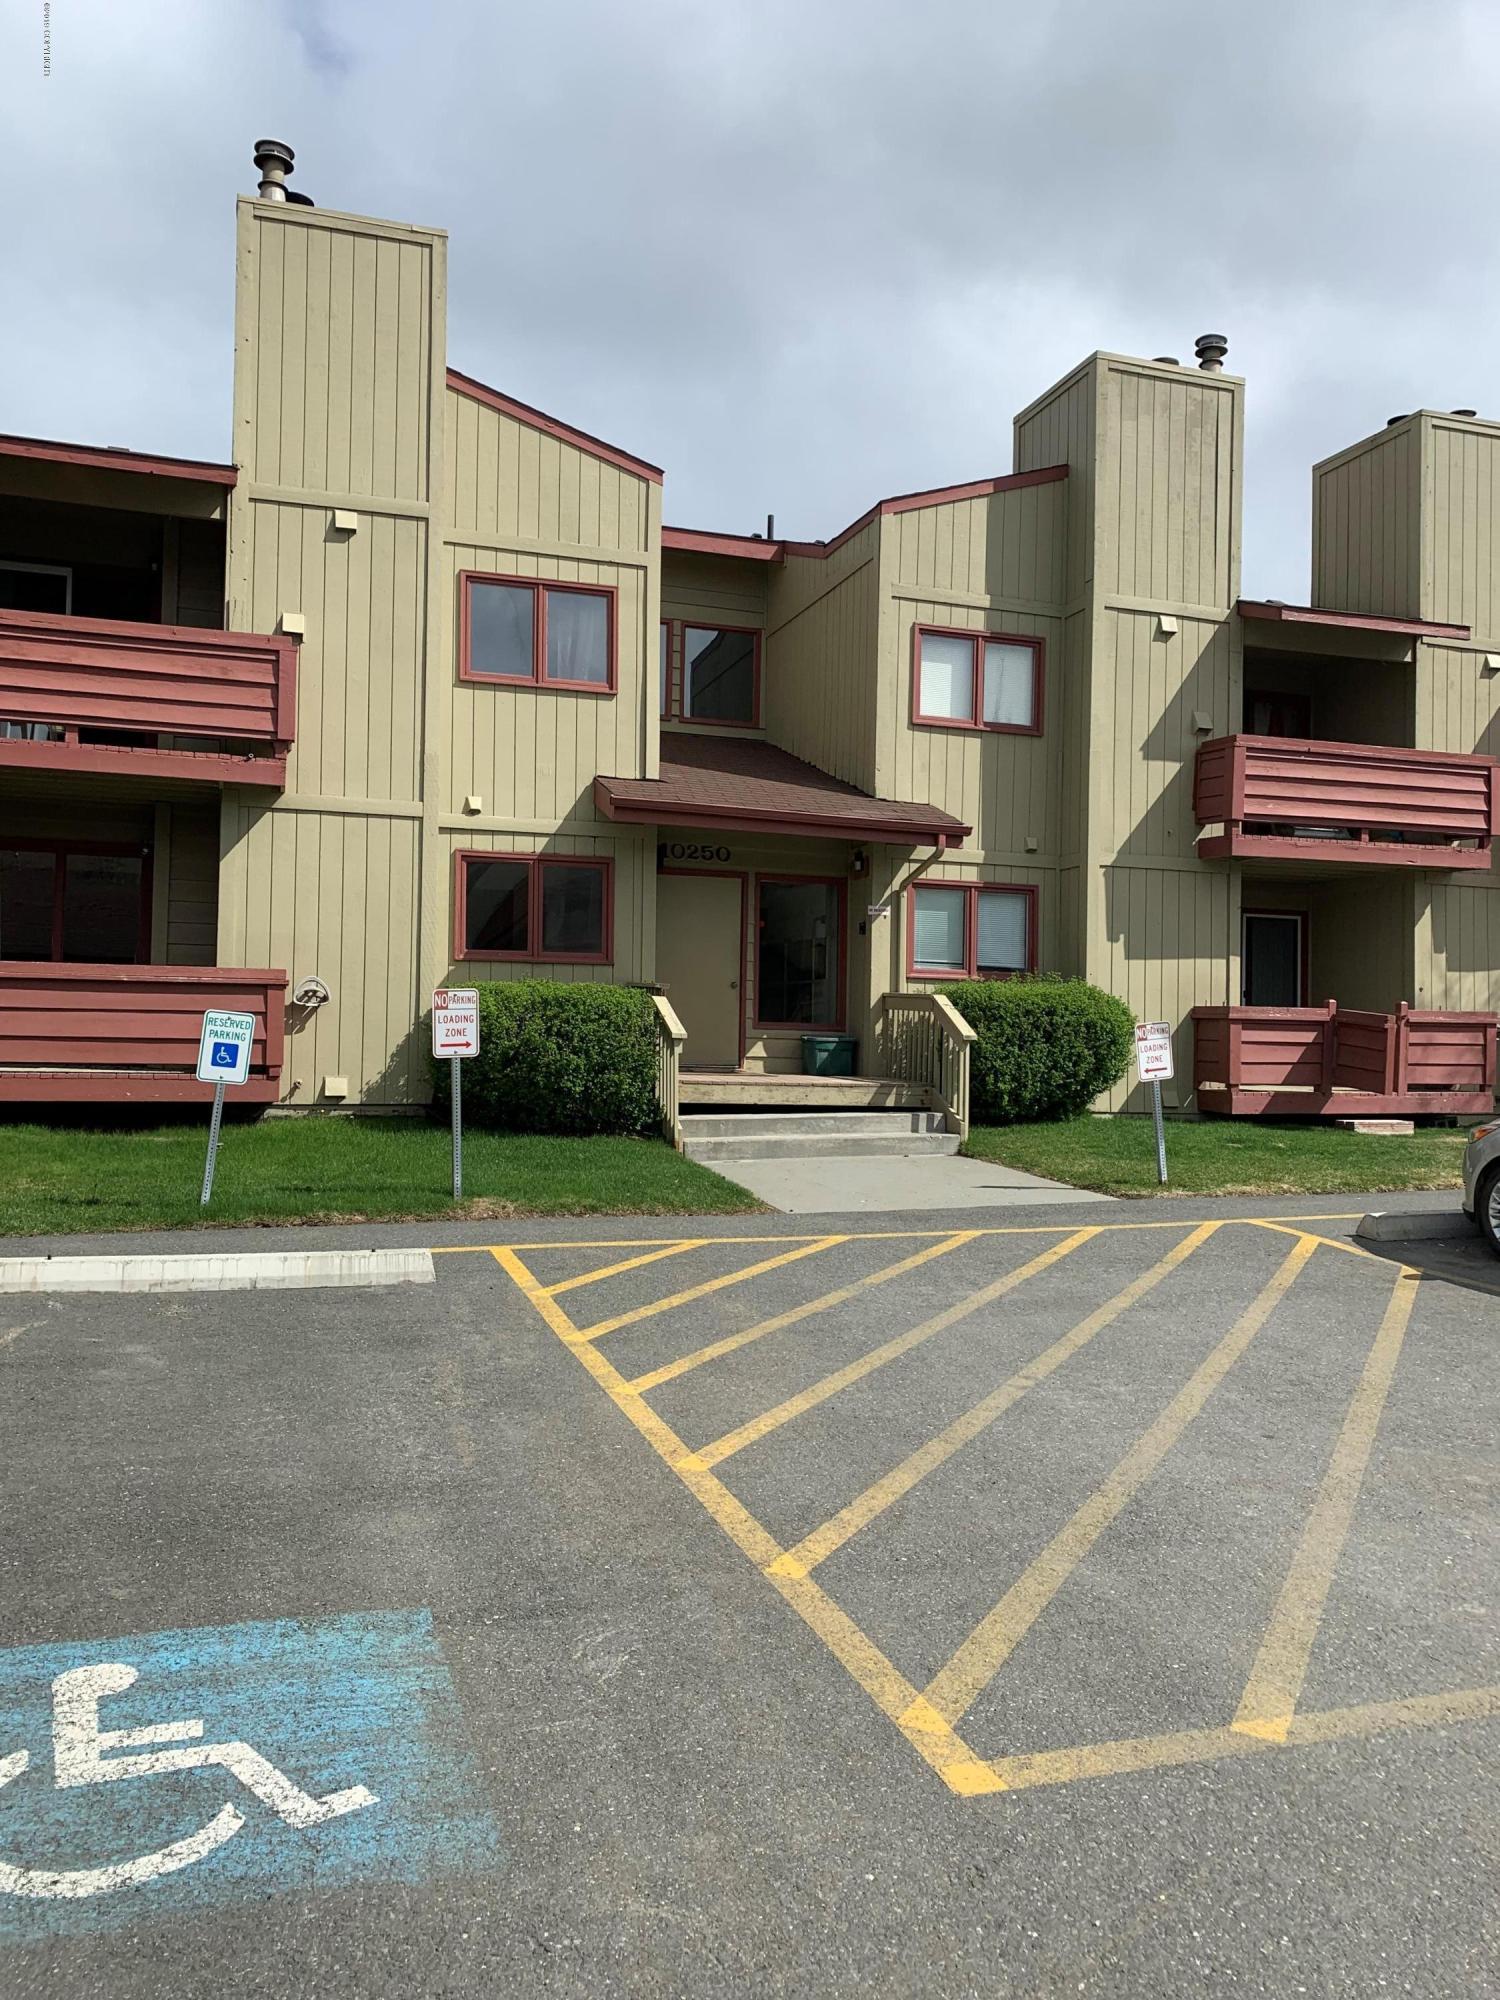 10250 Jamestown Drive, Anchorage, Alaska